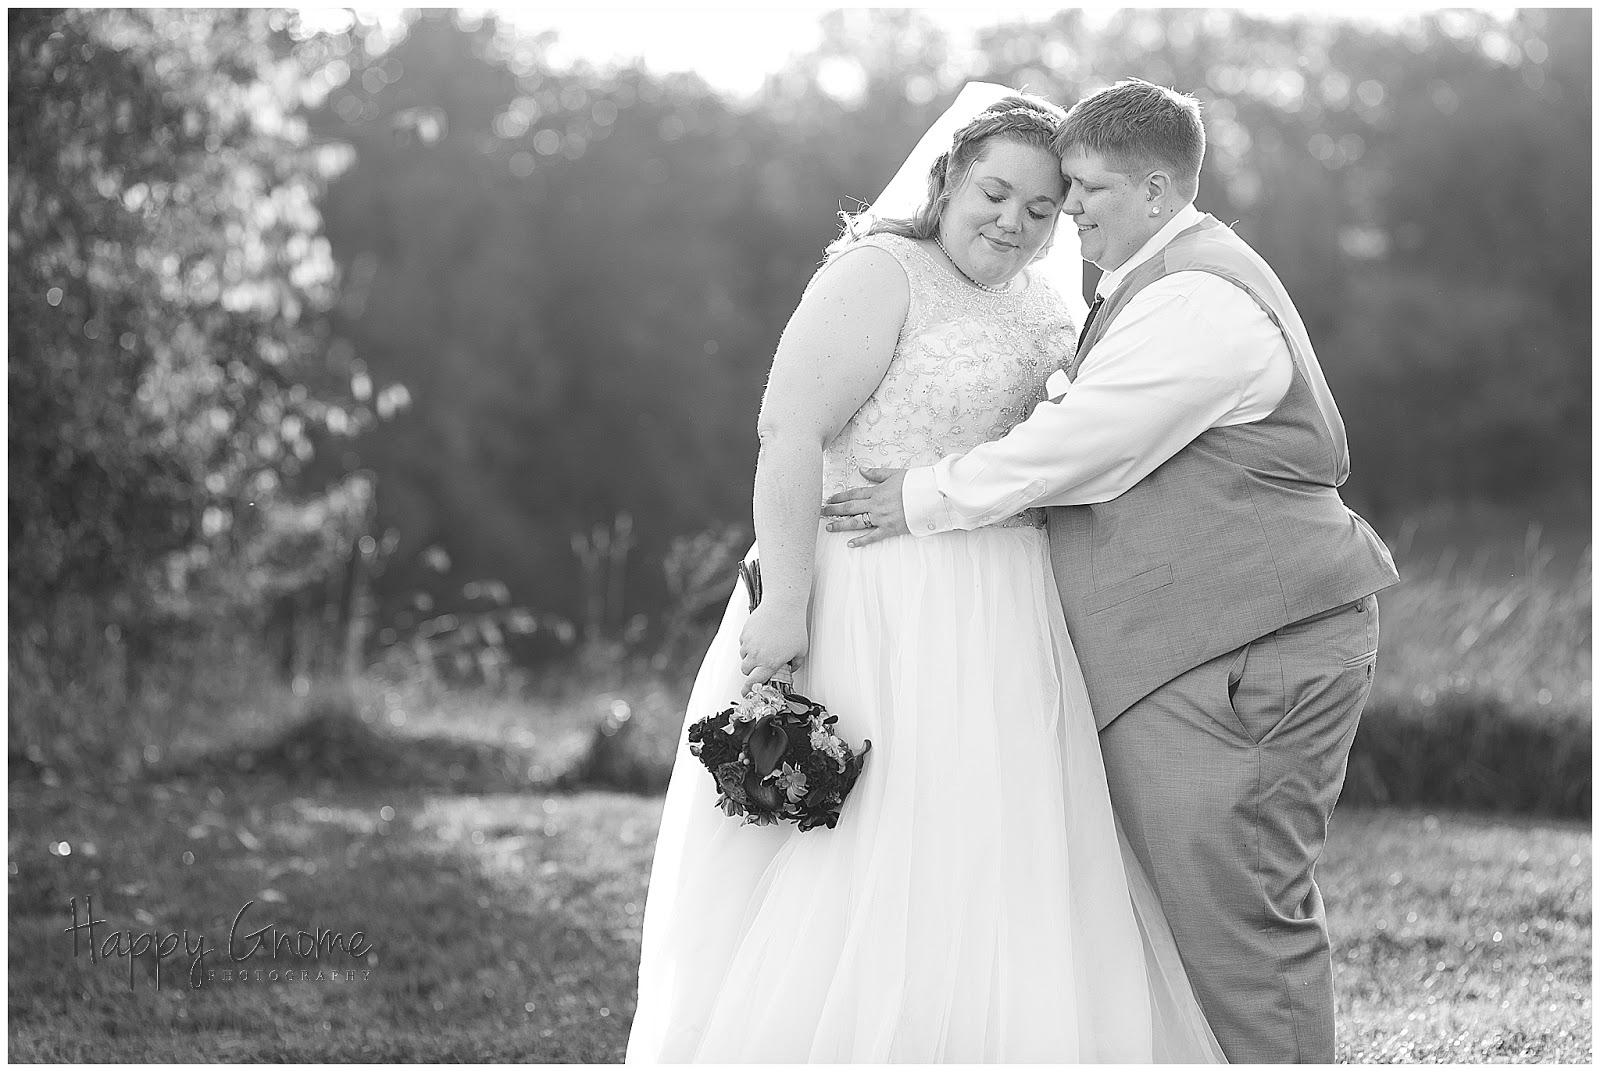 Sure We Have Romance In Wisconsin >> Maggie And Alicia Rustic Manor Delafield Wisconsin Wedding